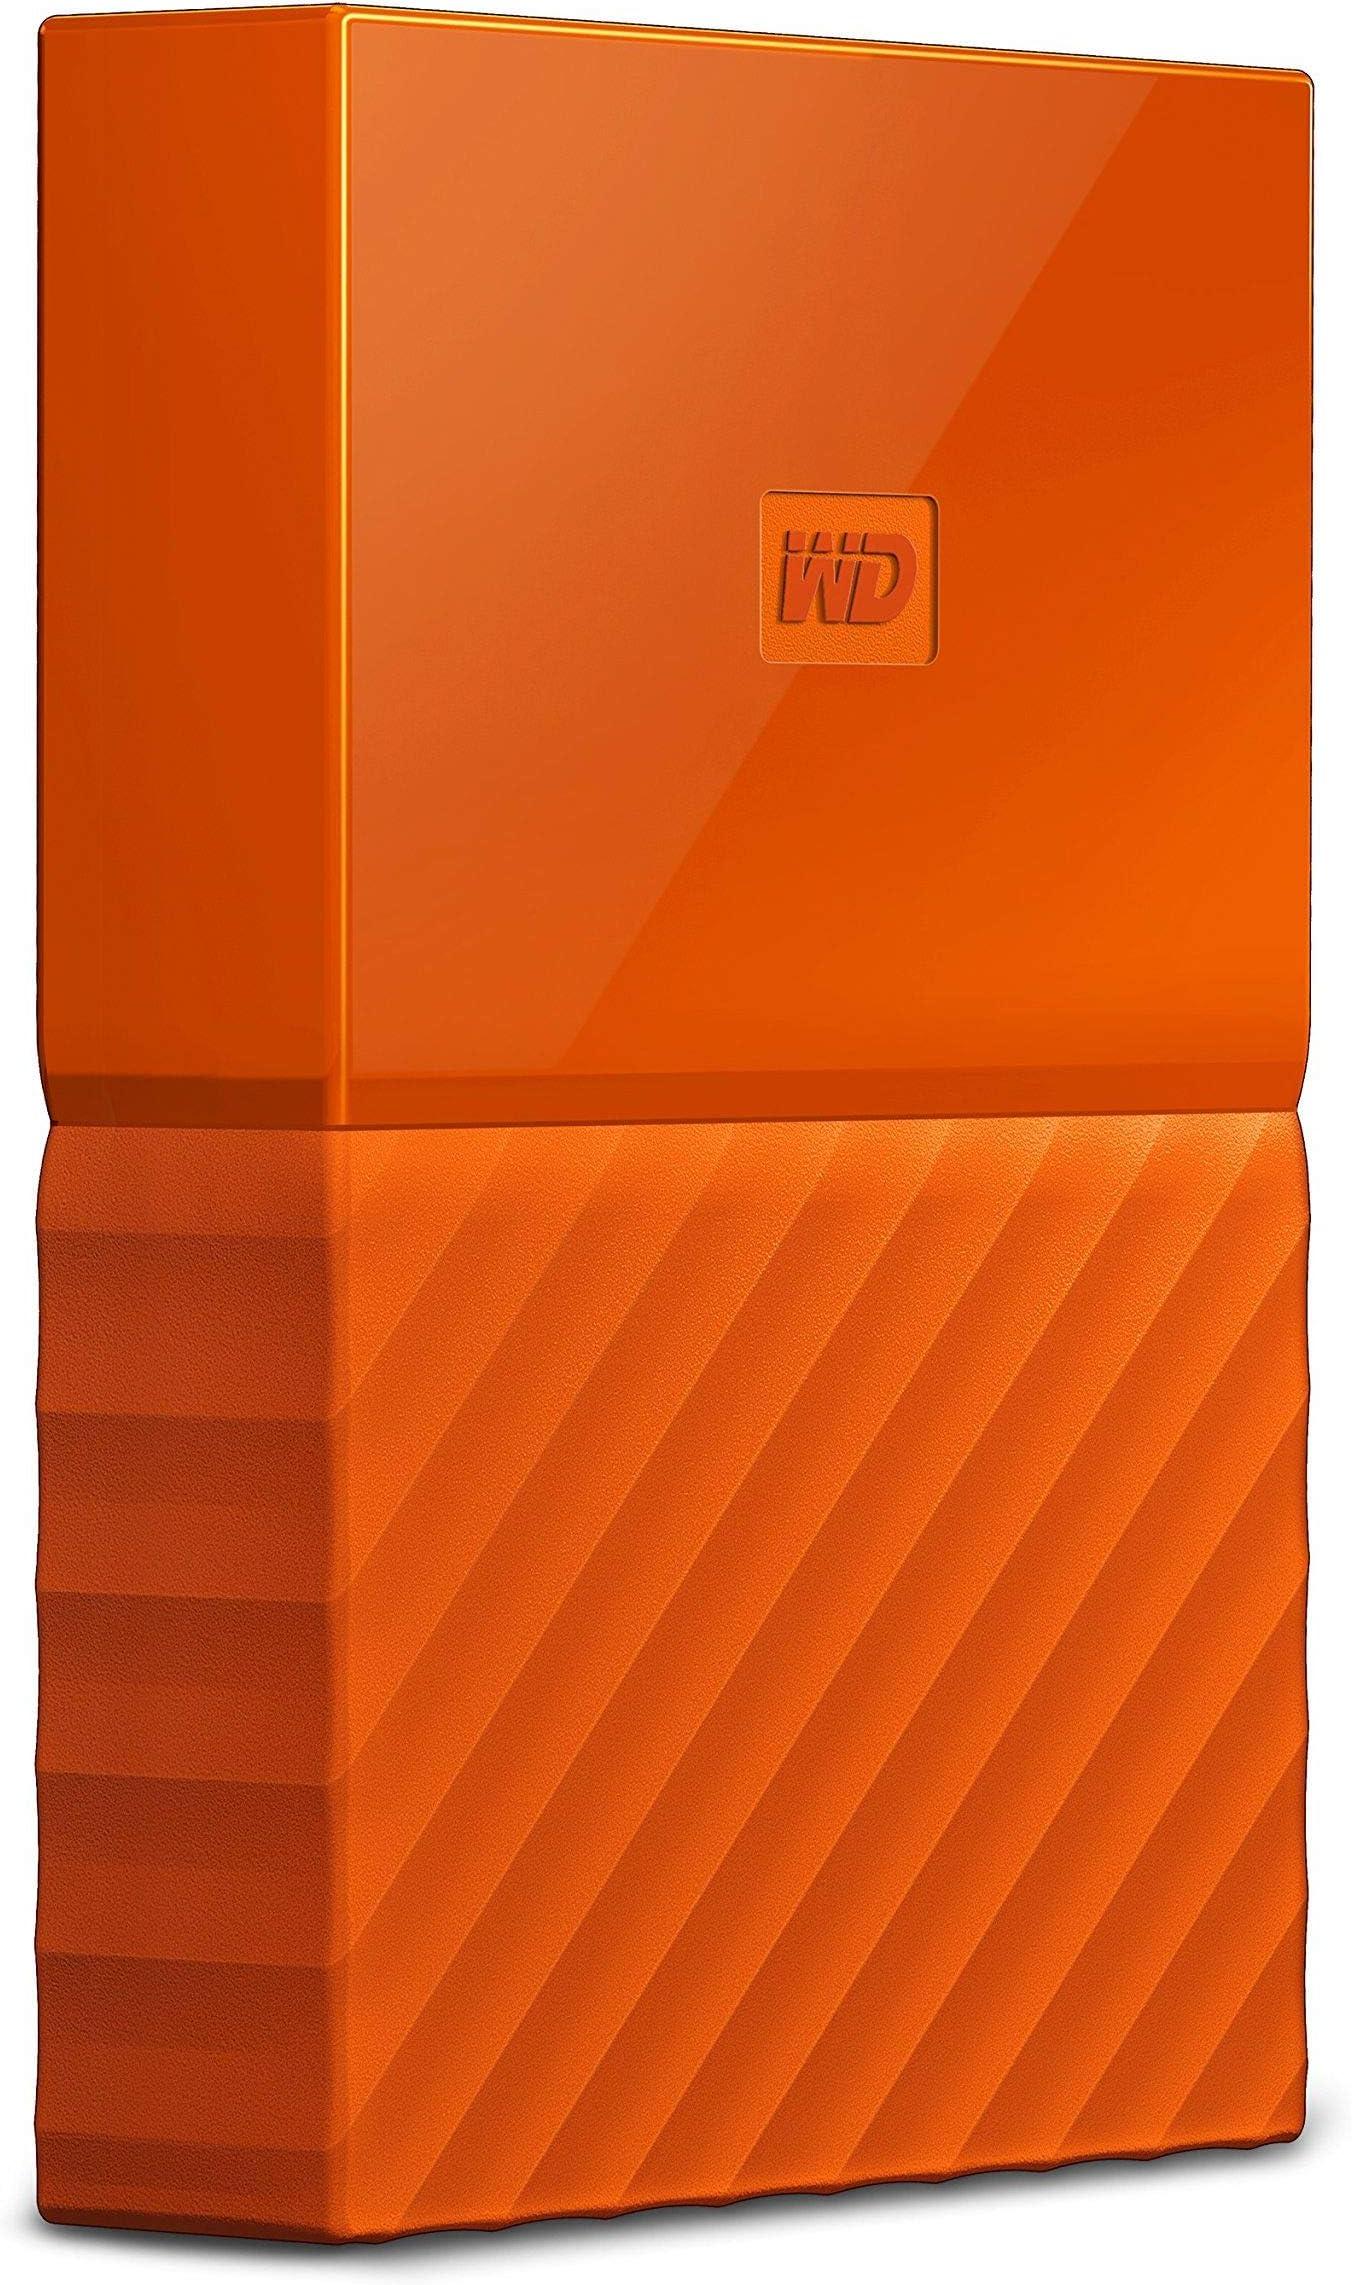 WD 1TB Orange USB 3.0 My Passport Portable External Hard Drive (WDBYNN0010BOR-WESN)